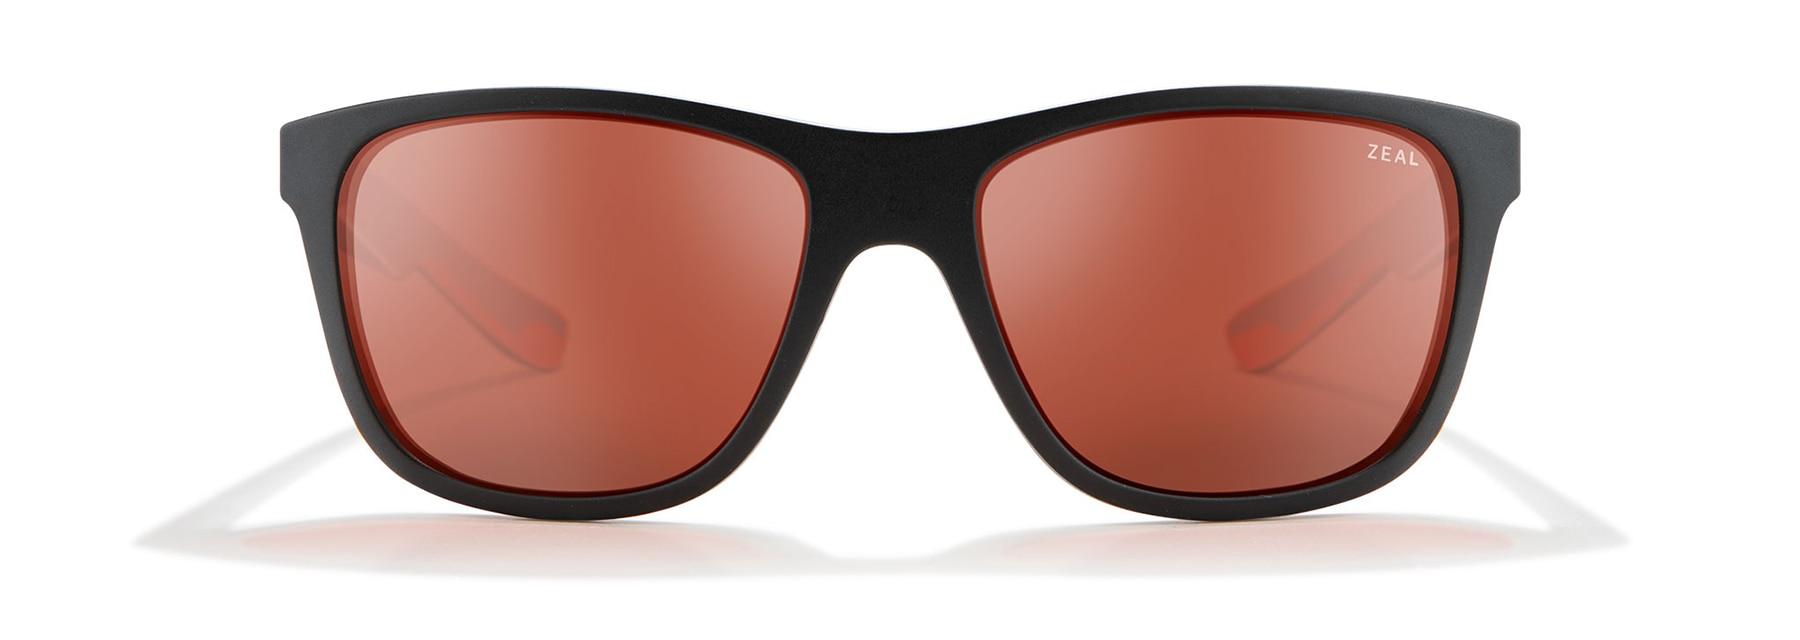 4f83f0bb8e2 Shop RADIUM (Z1433) Sunglasses by Zeal